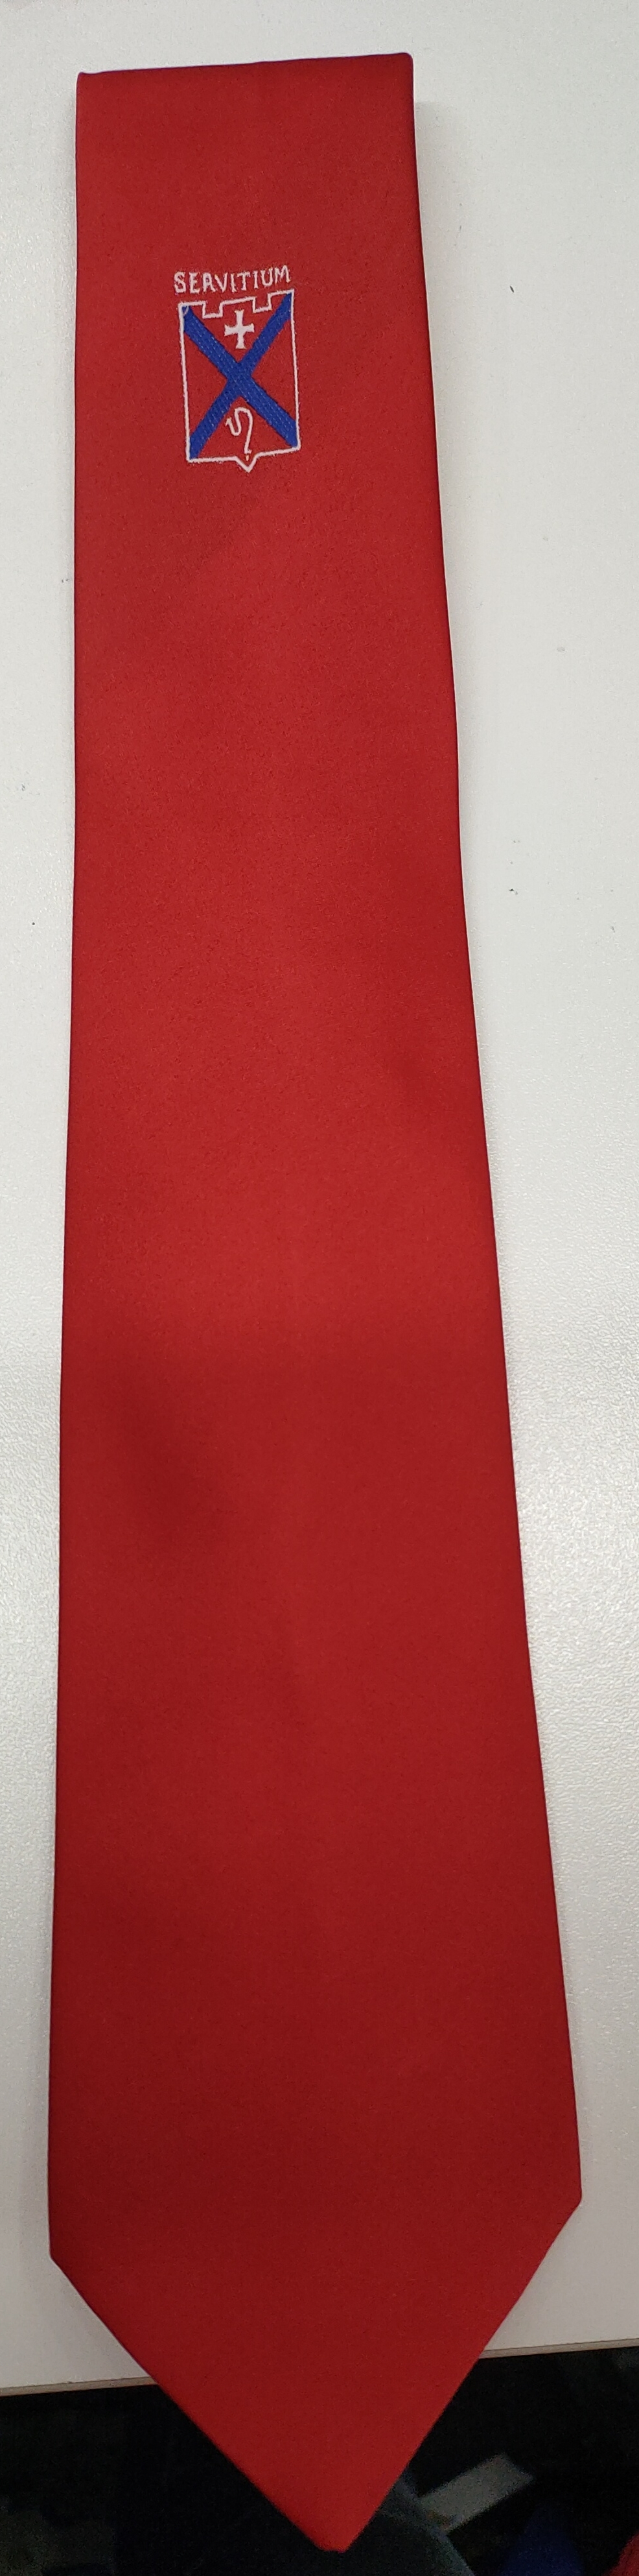 Mearns Castle High School S1 - S3 Tie (Red)